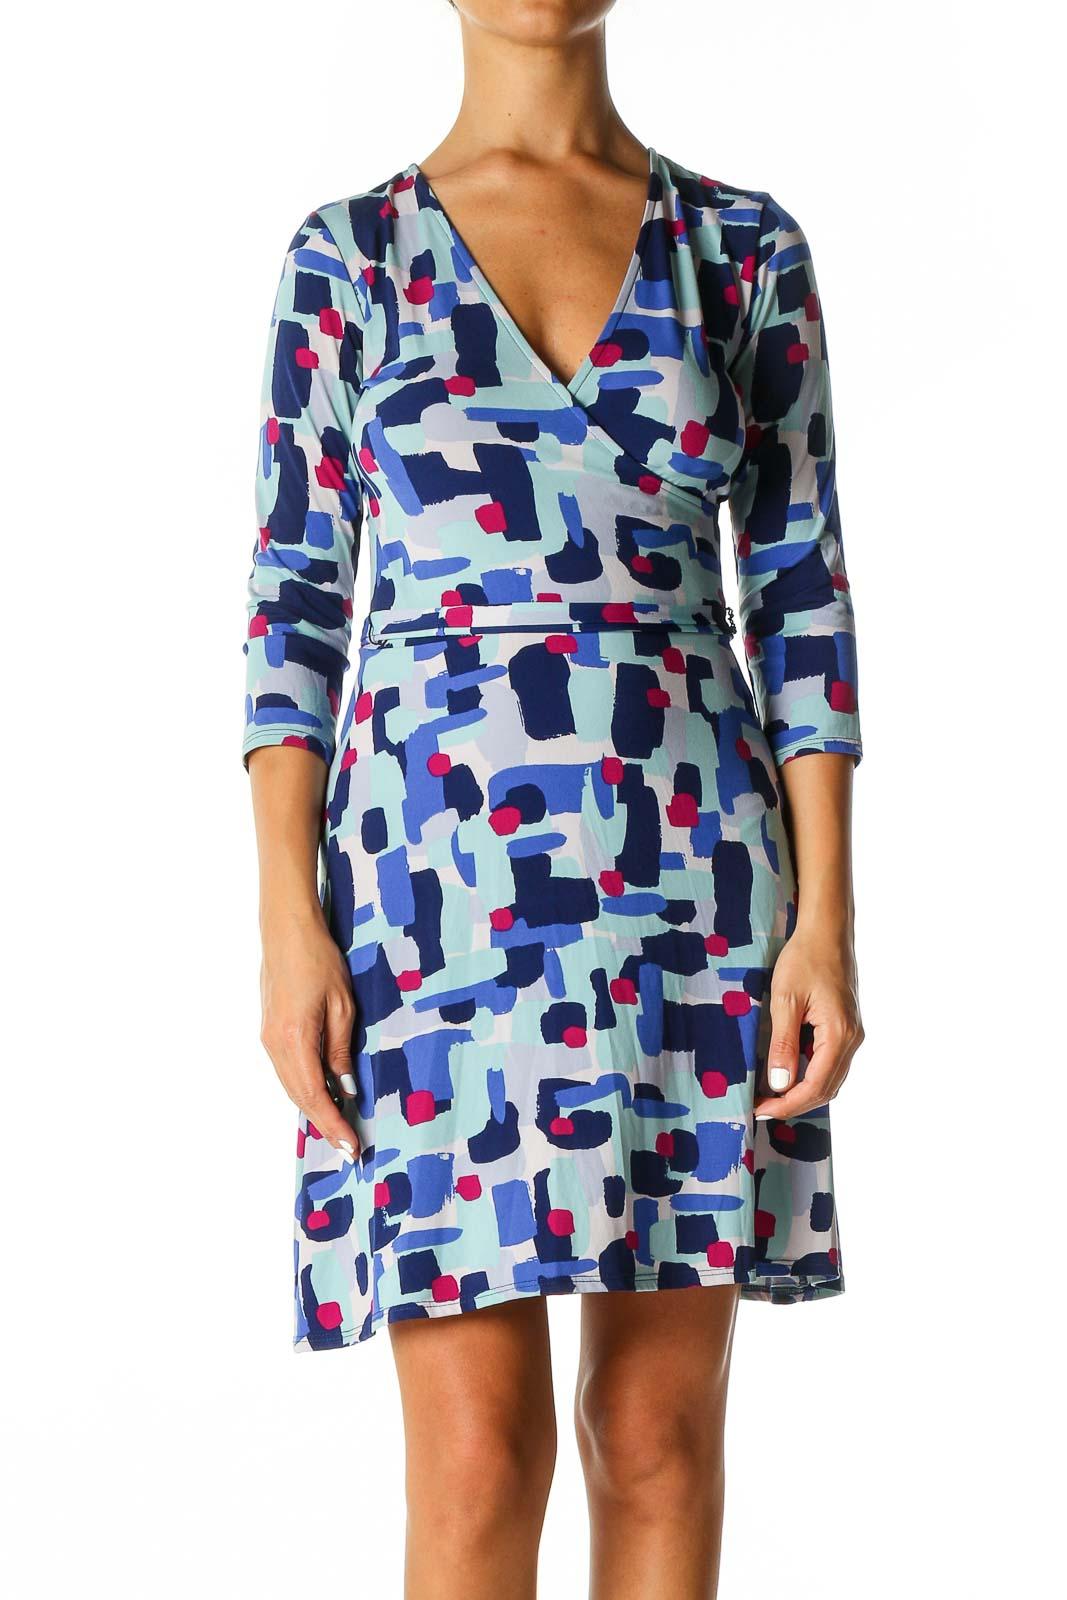 Blue Geometric Print Holiday Shift Dress Front